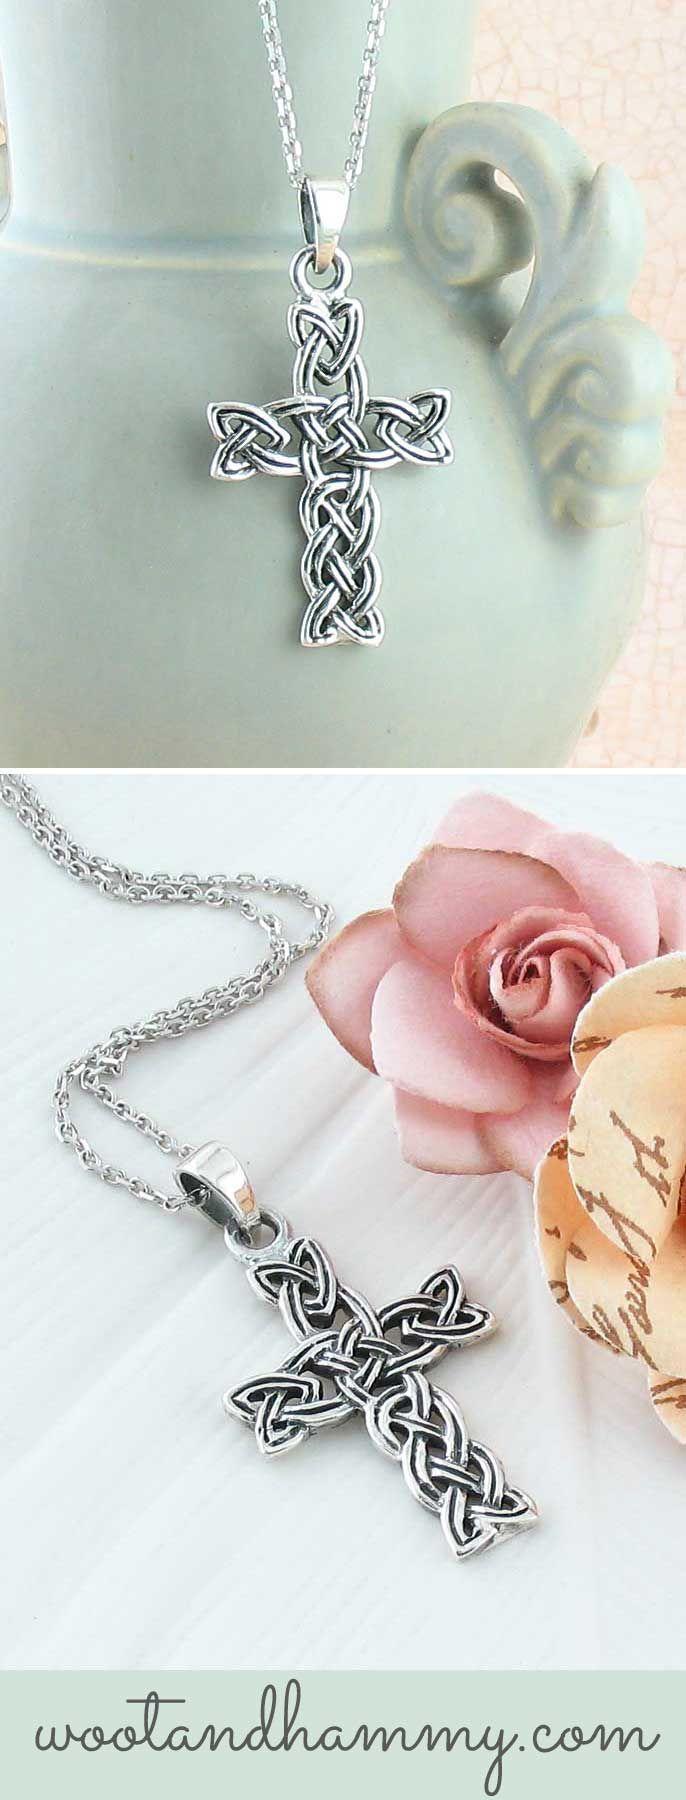 Woven Celtic Cross Necklace | Pinterest | Drahtschmuck